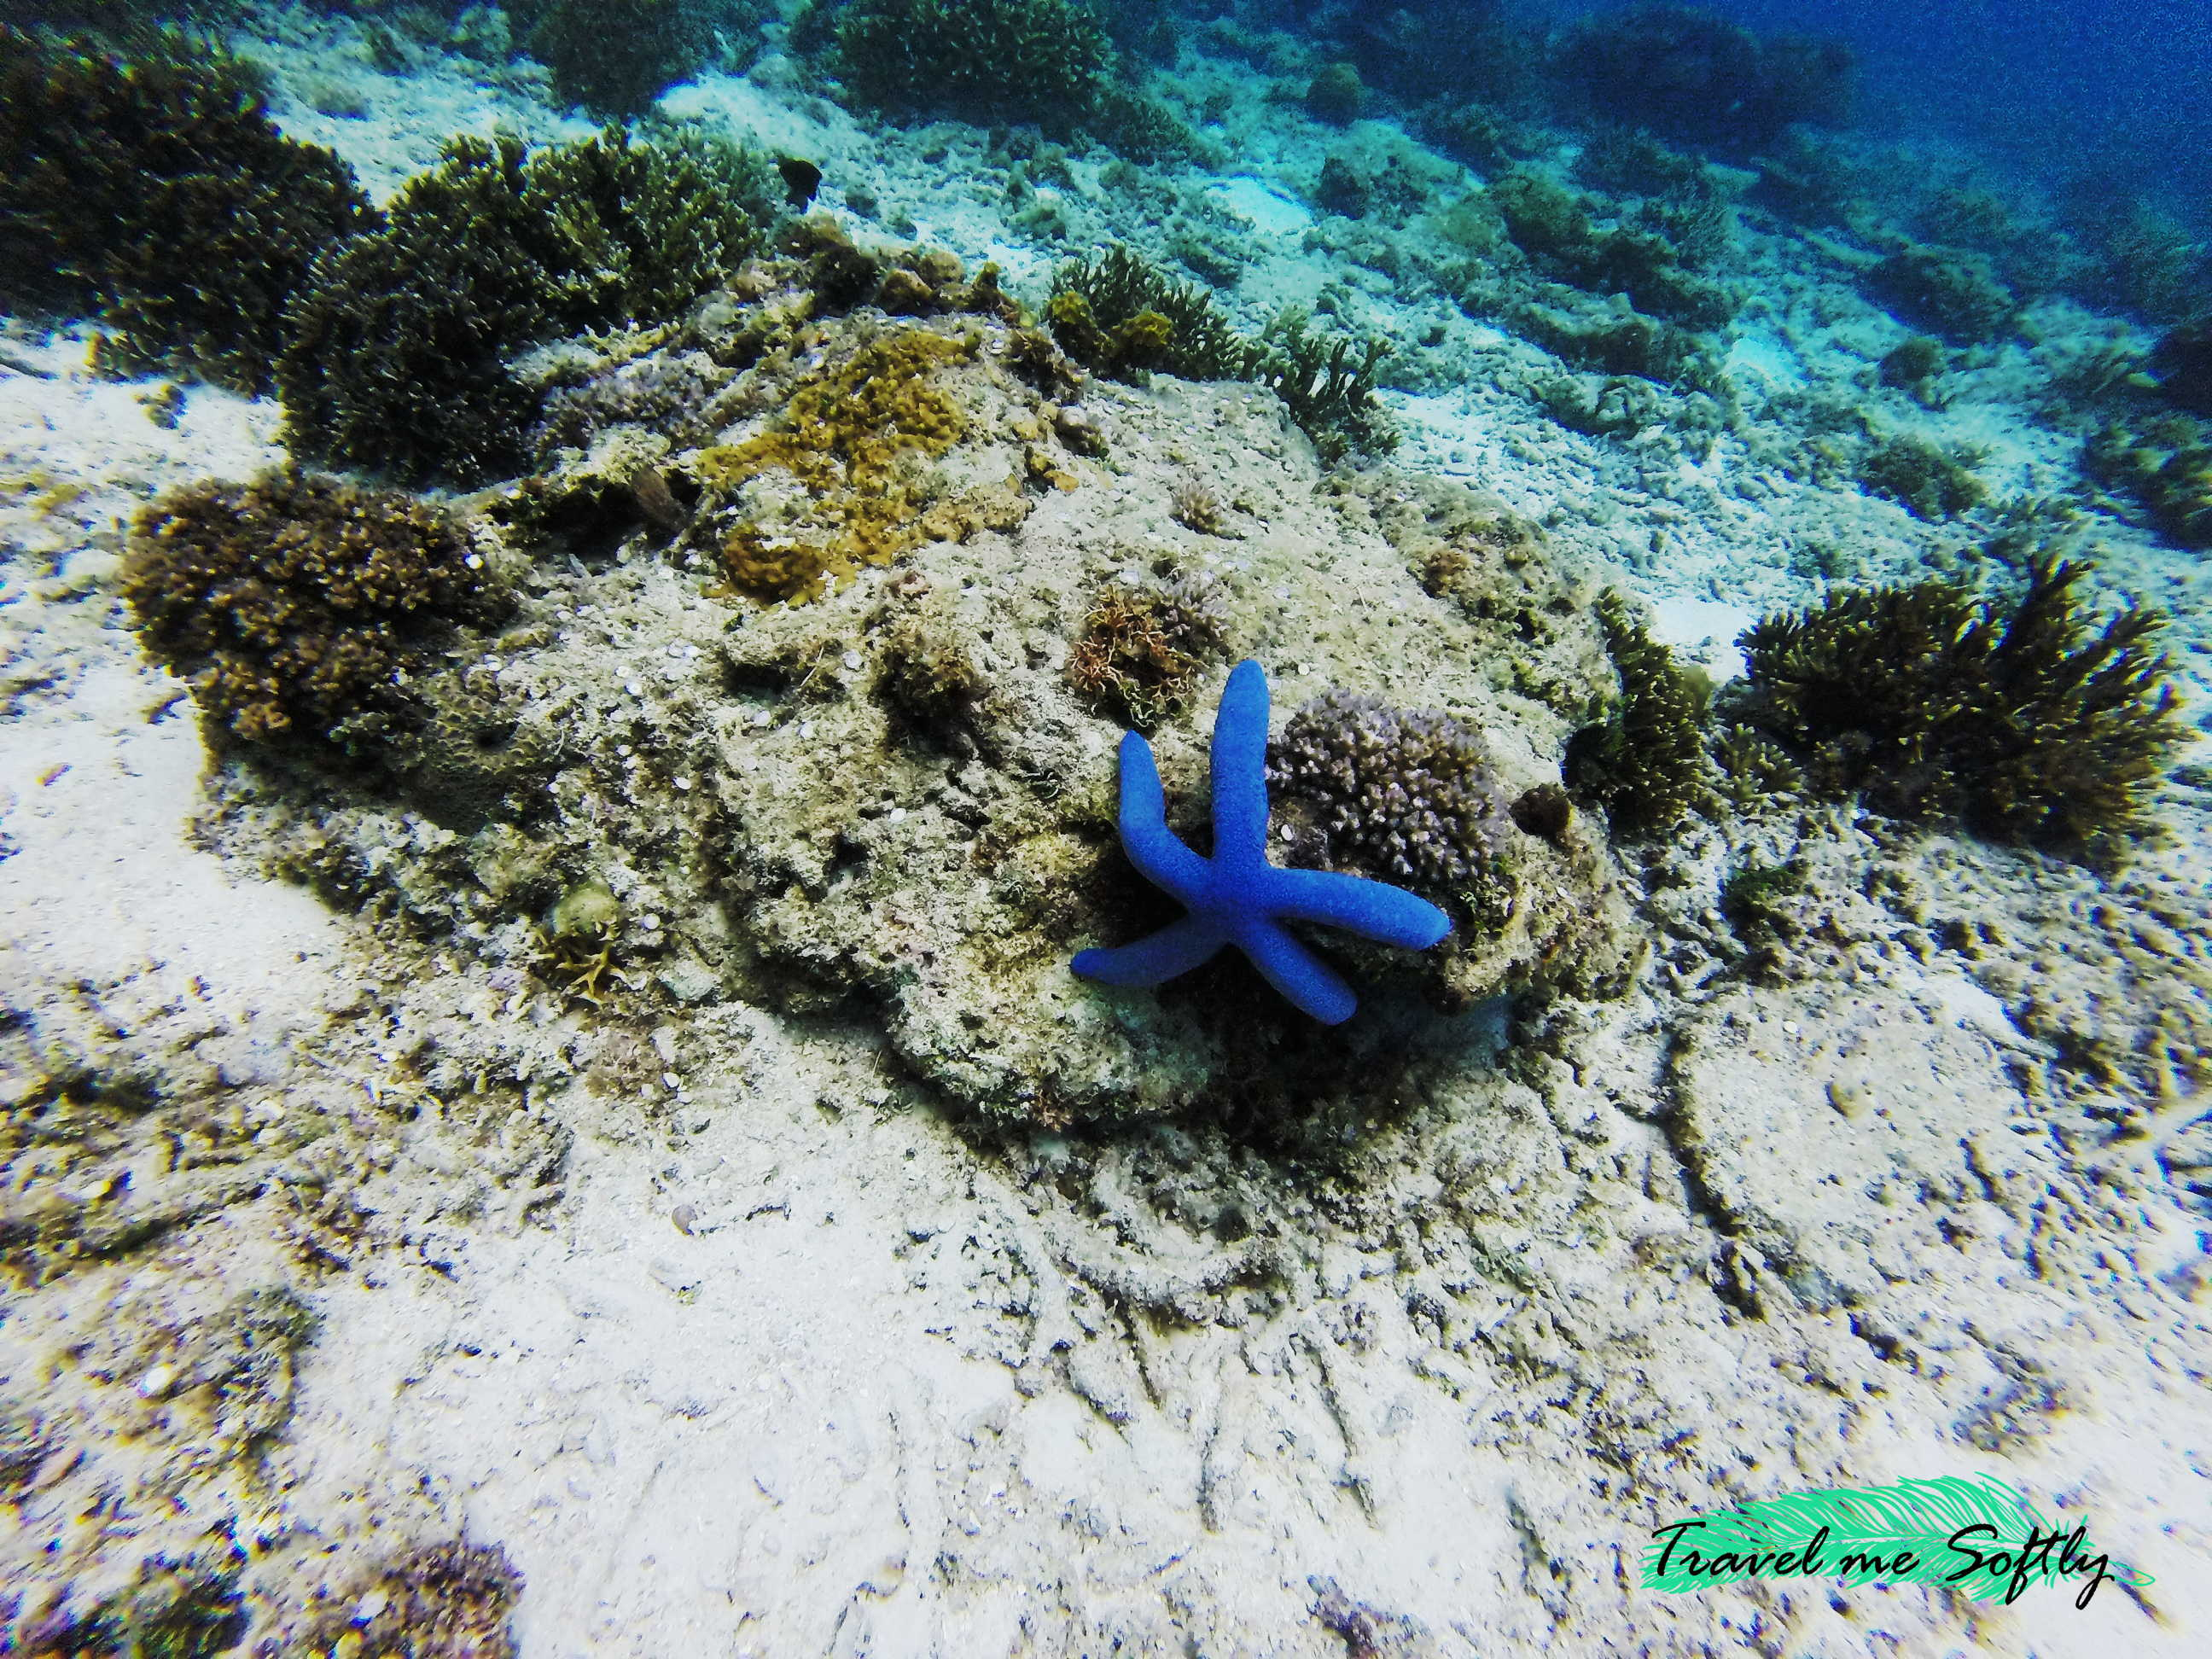 viajes de buceo estrella de mar